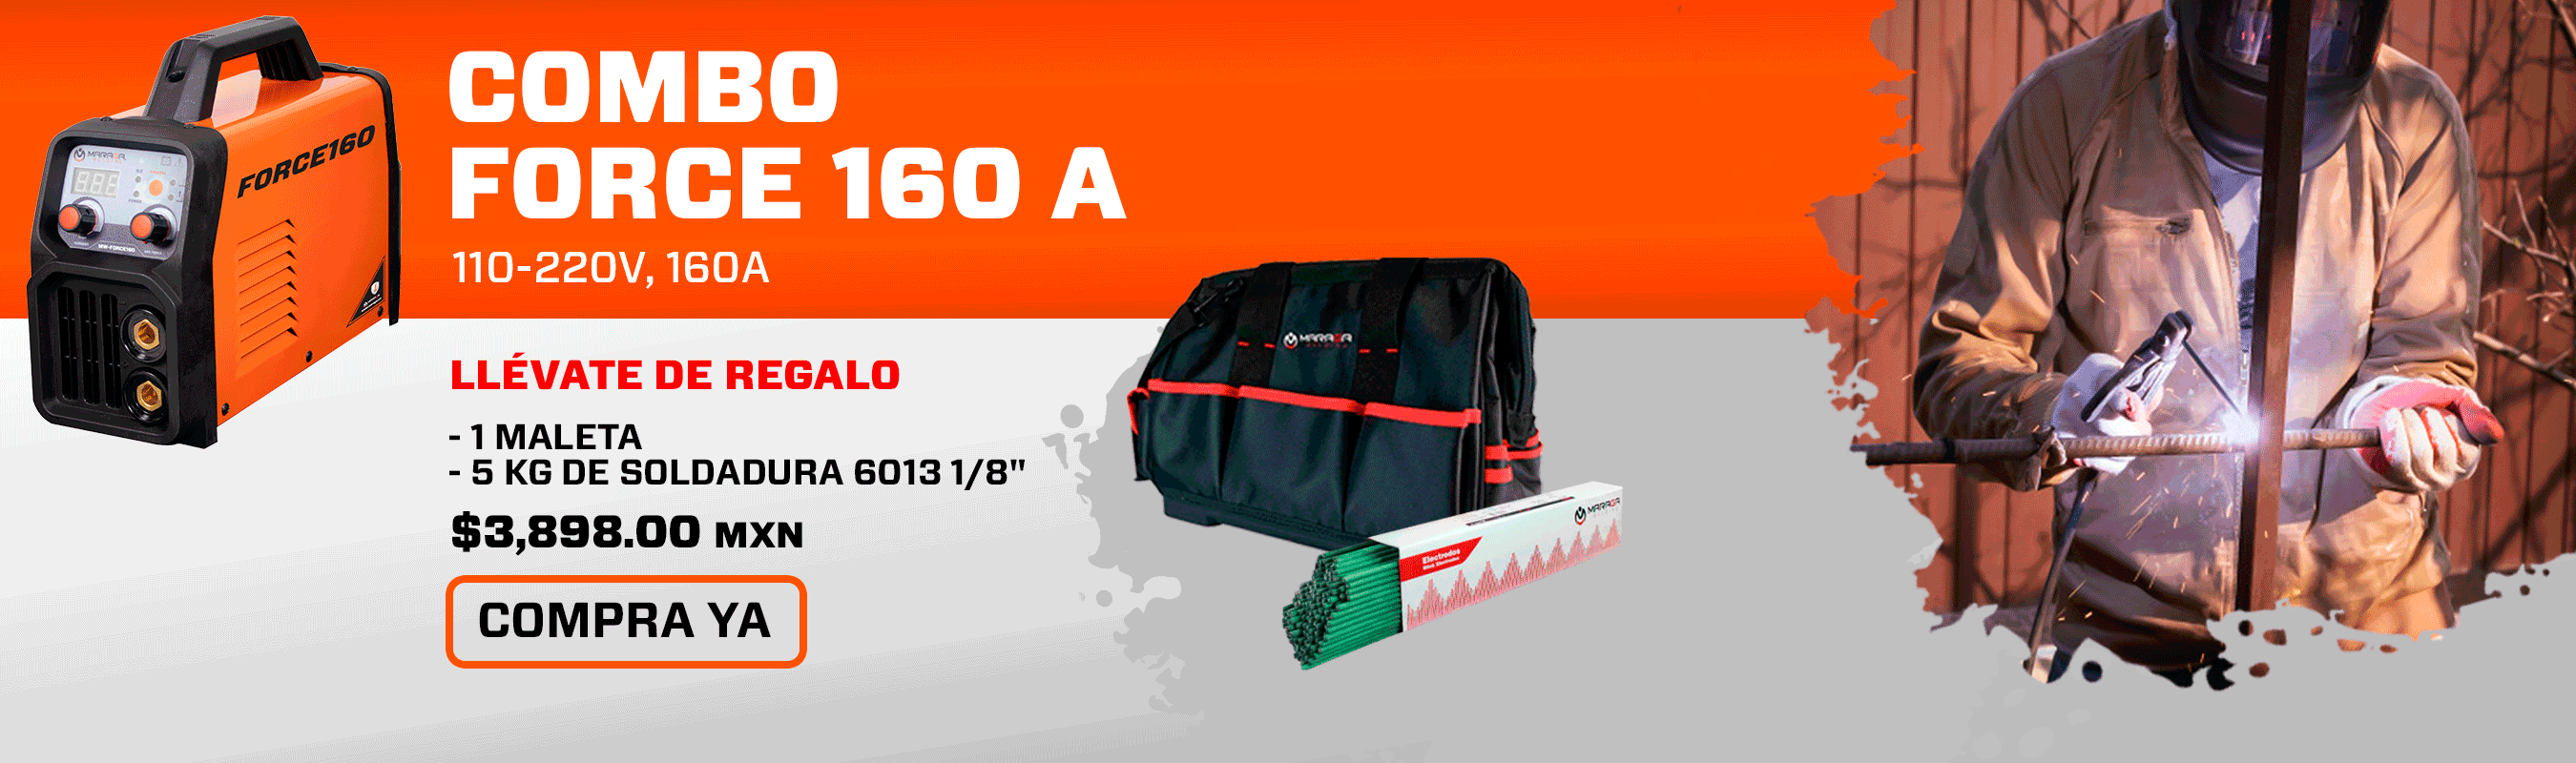 Combo Soldadora Force160 + 5KG Soldadura 6013 + Maleta